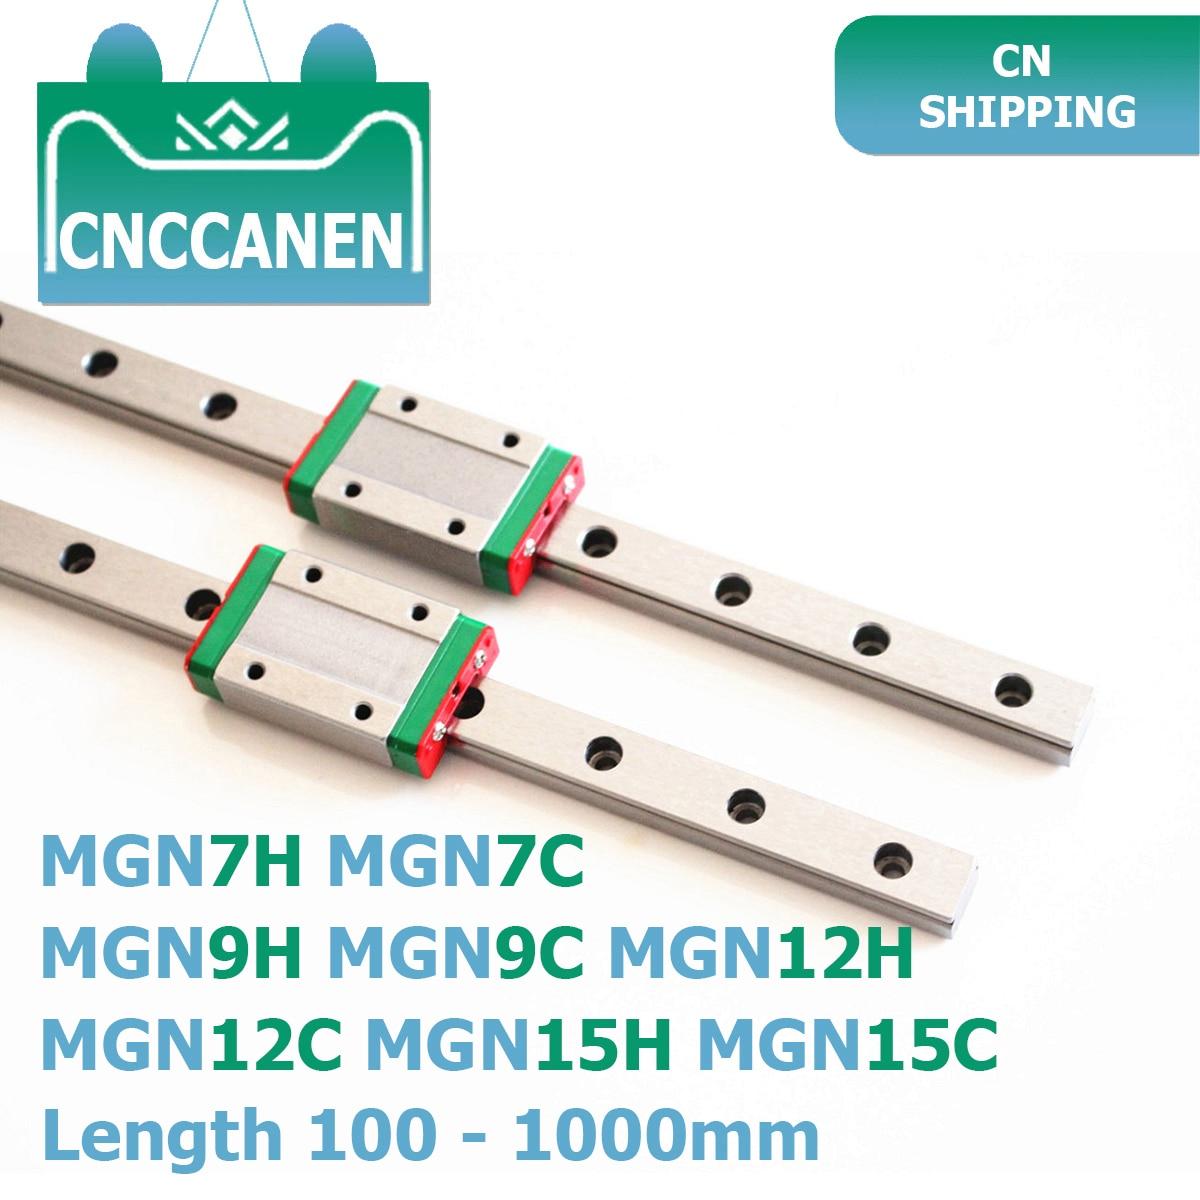 MGN7 MGN9 MGN12 MGN15 100-1000mm לינארי רכבת שקופיות 2PCS MGN9 ליניארי מדריך + 2PCS MGN9H או MGN9C תובלה 3D מדפסת CNC